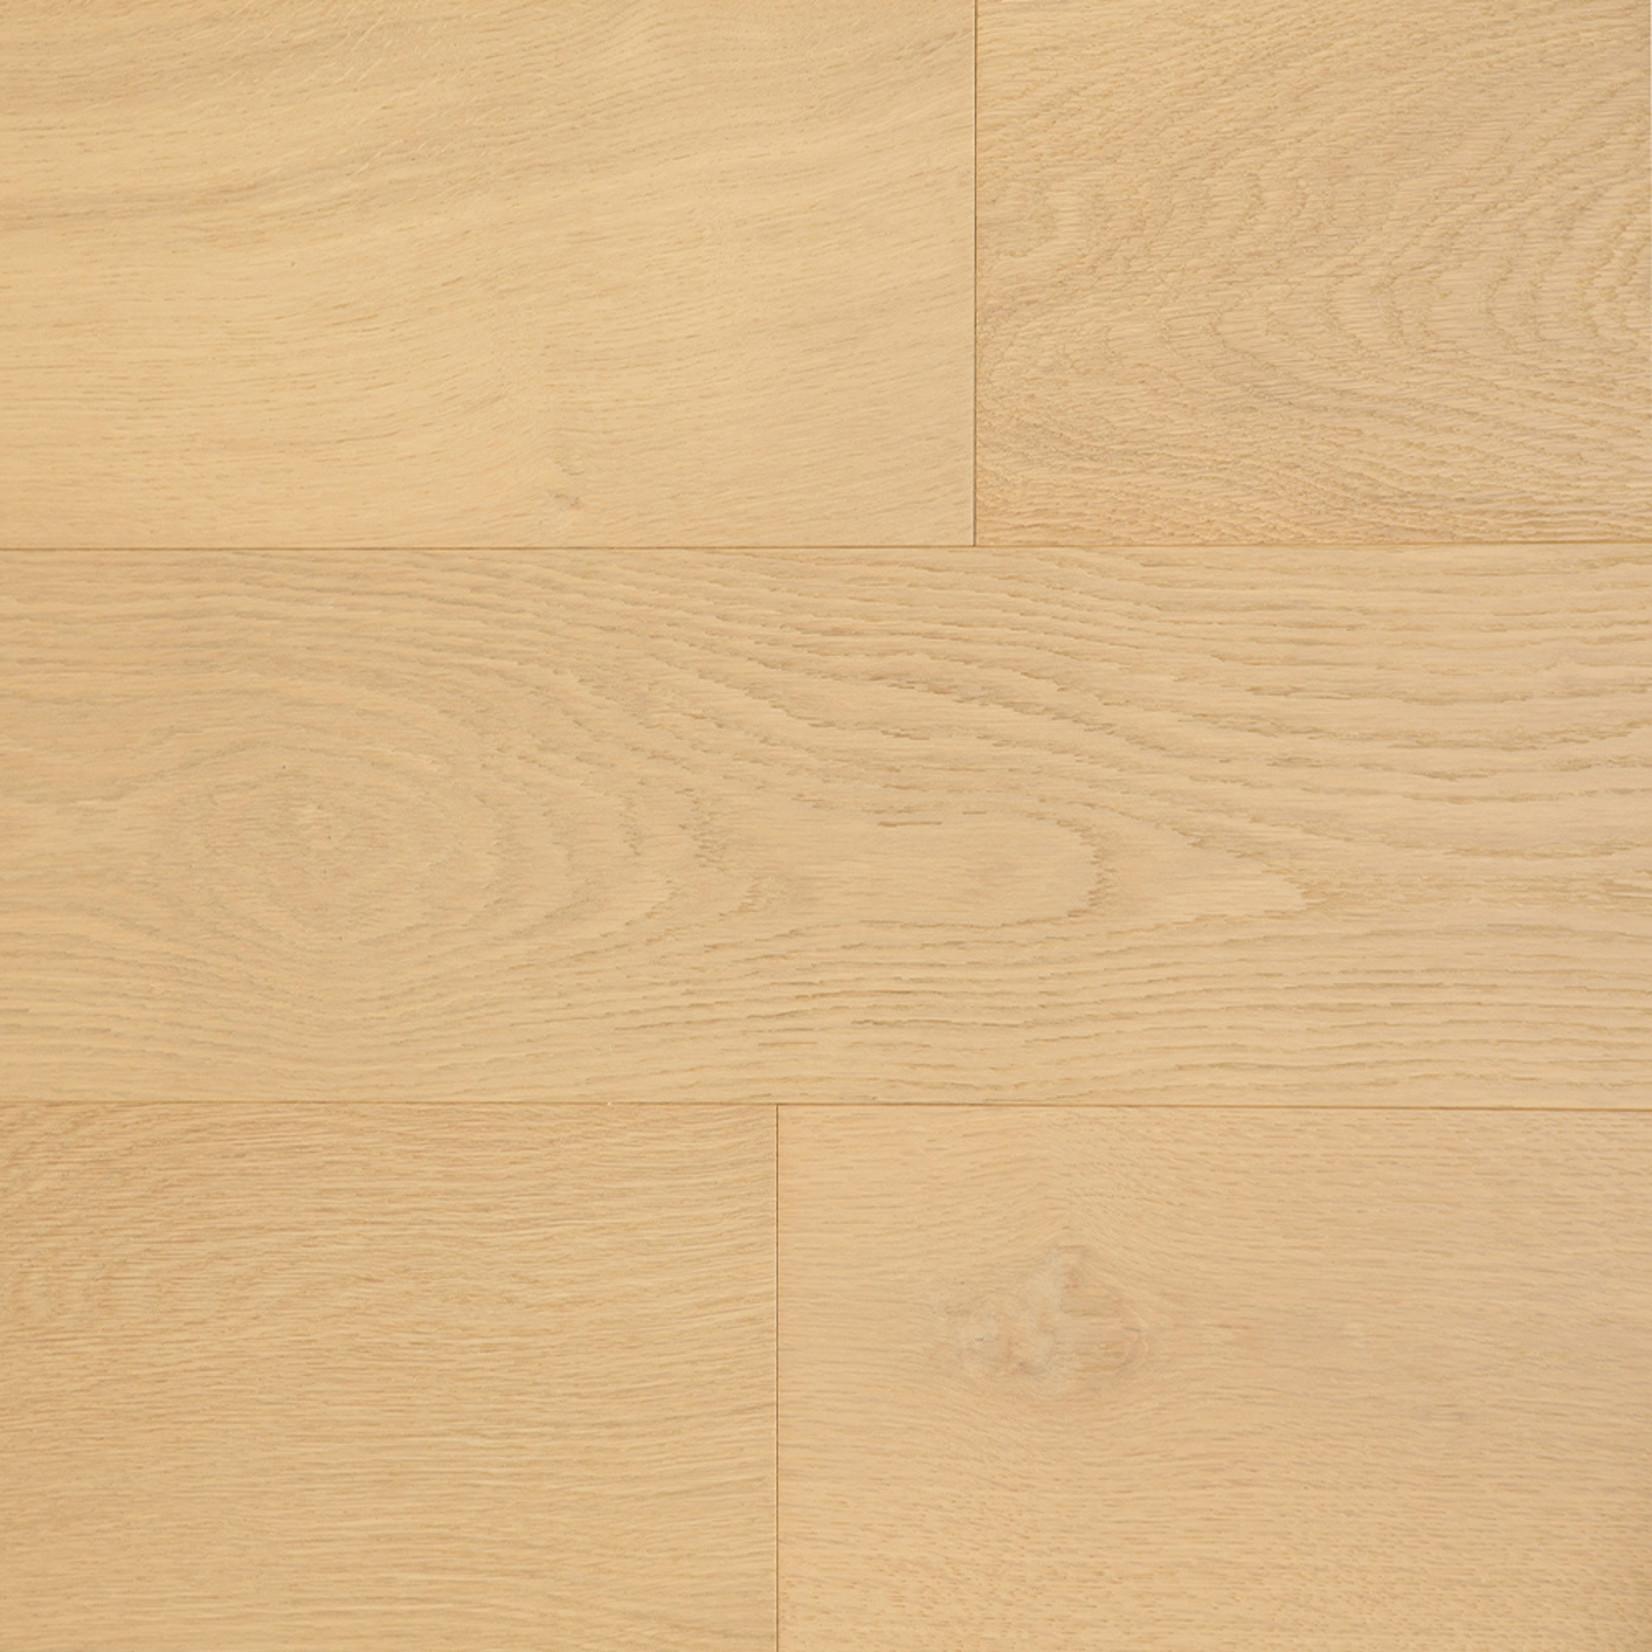 "Vidar Design Flooring Vidar - Ingénierie 3/4"" Chêne verni mat"